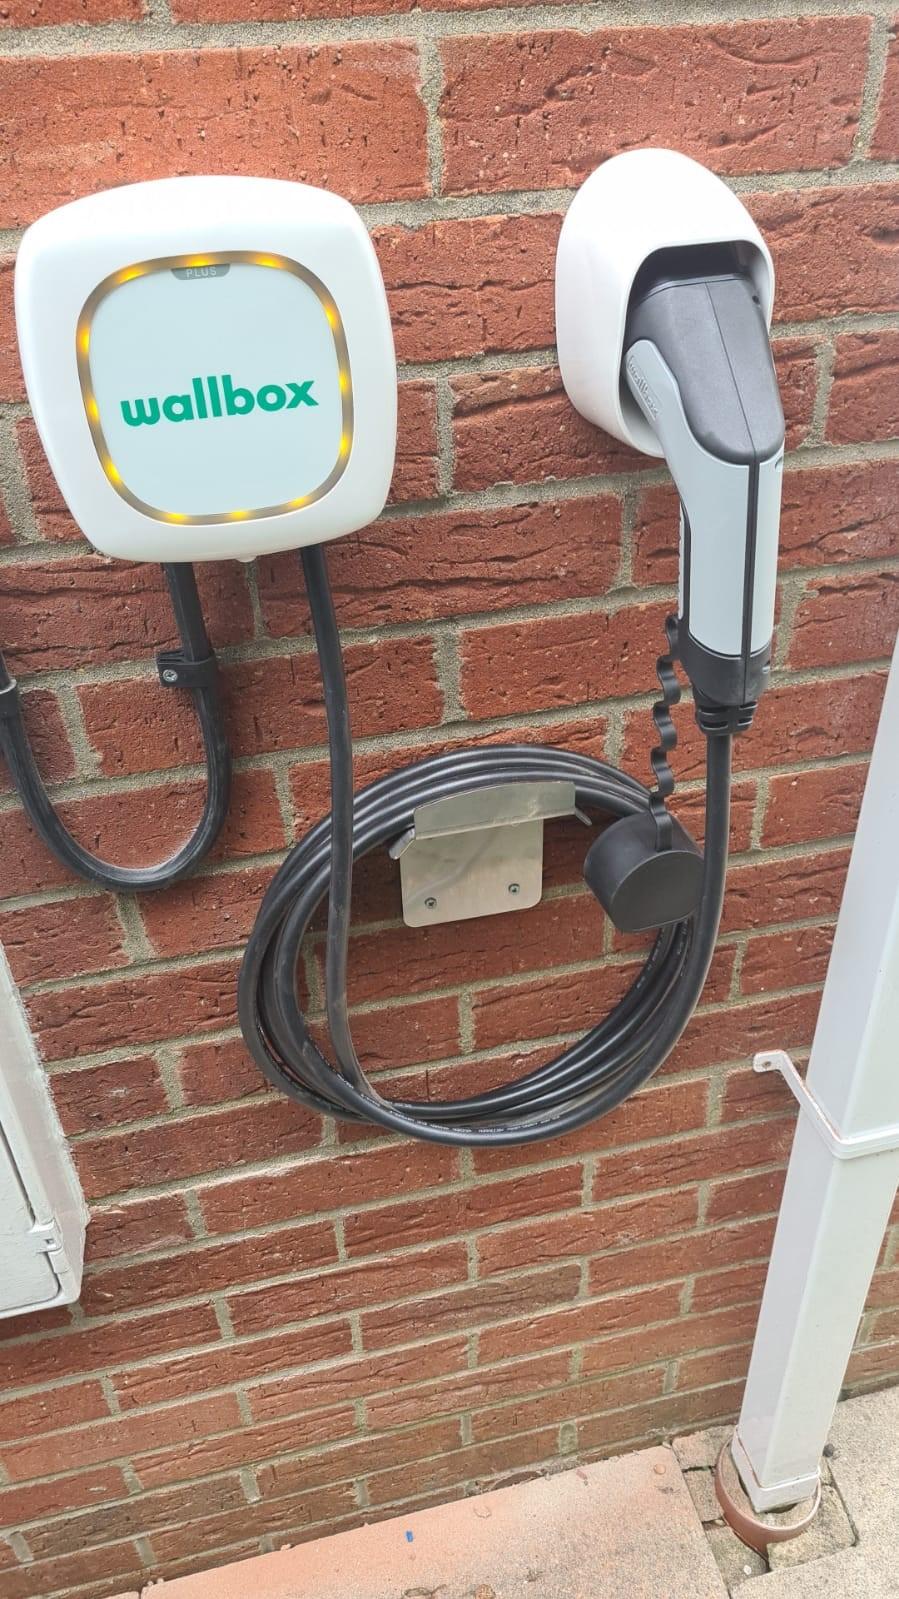 wallbox-plus